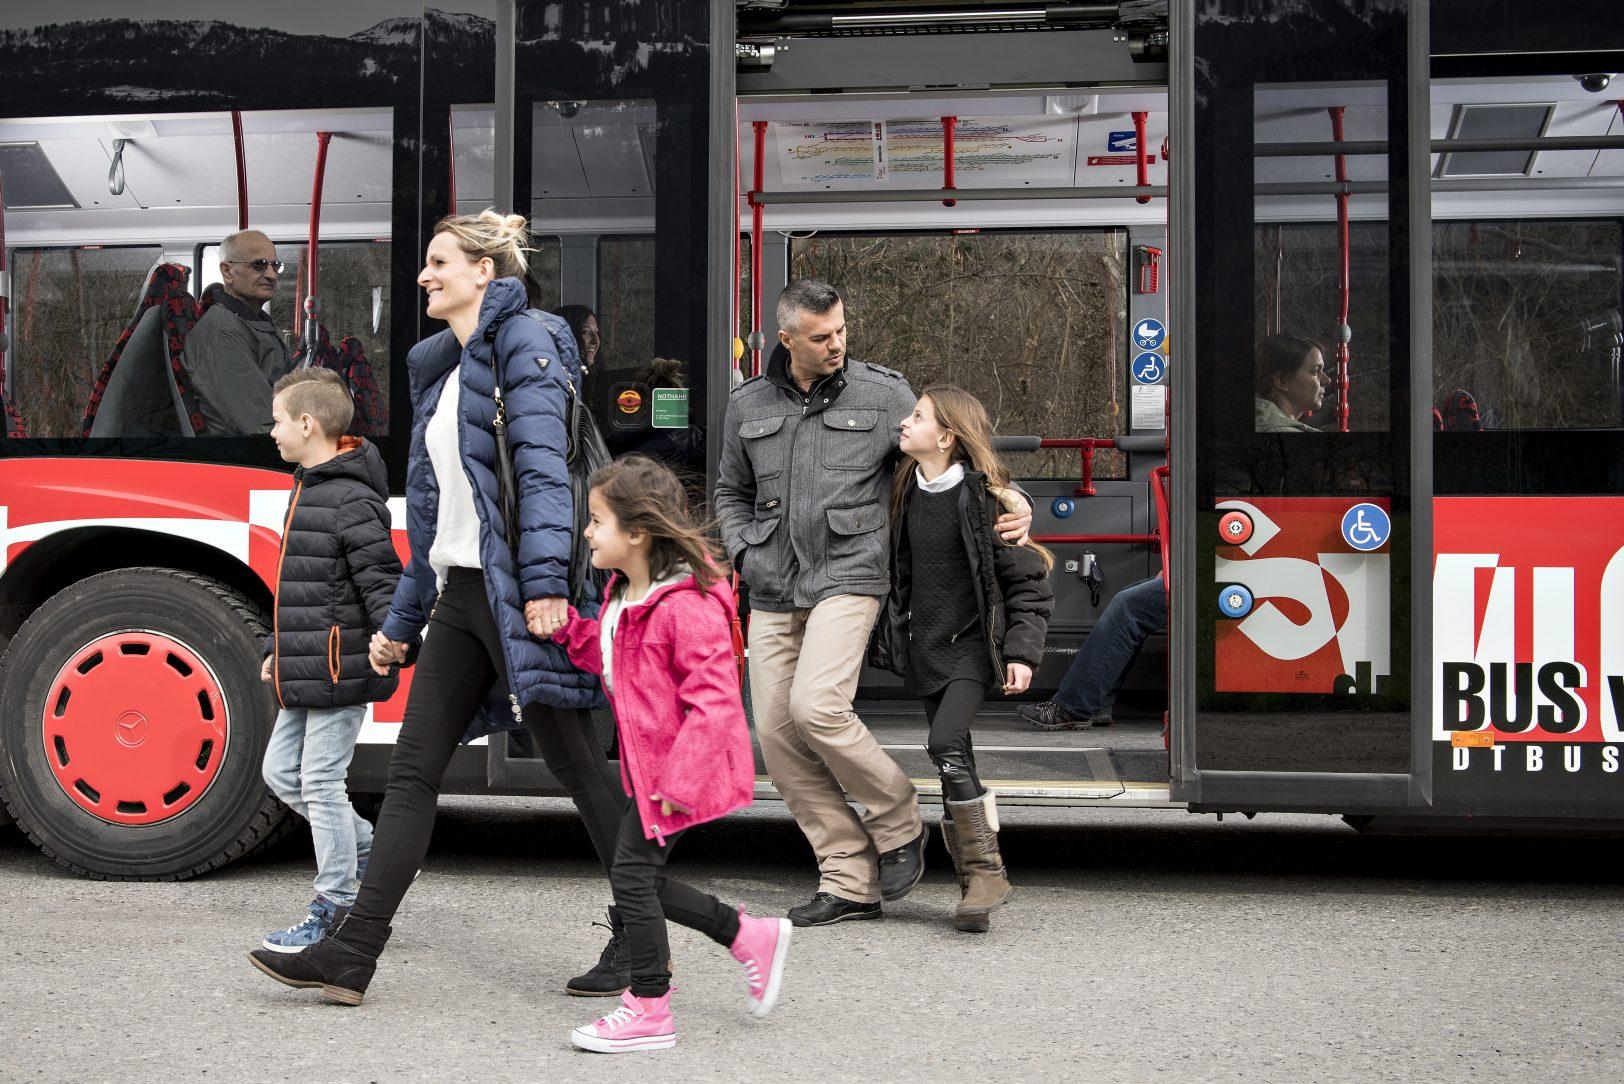 churbus_einstieg-bus